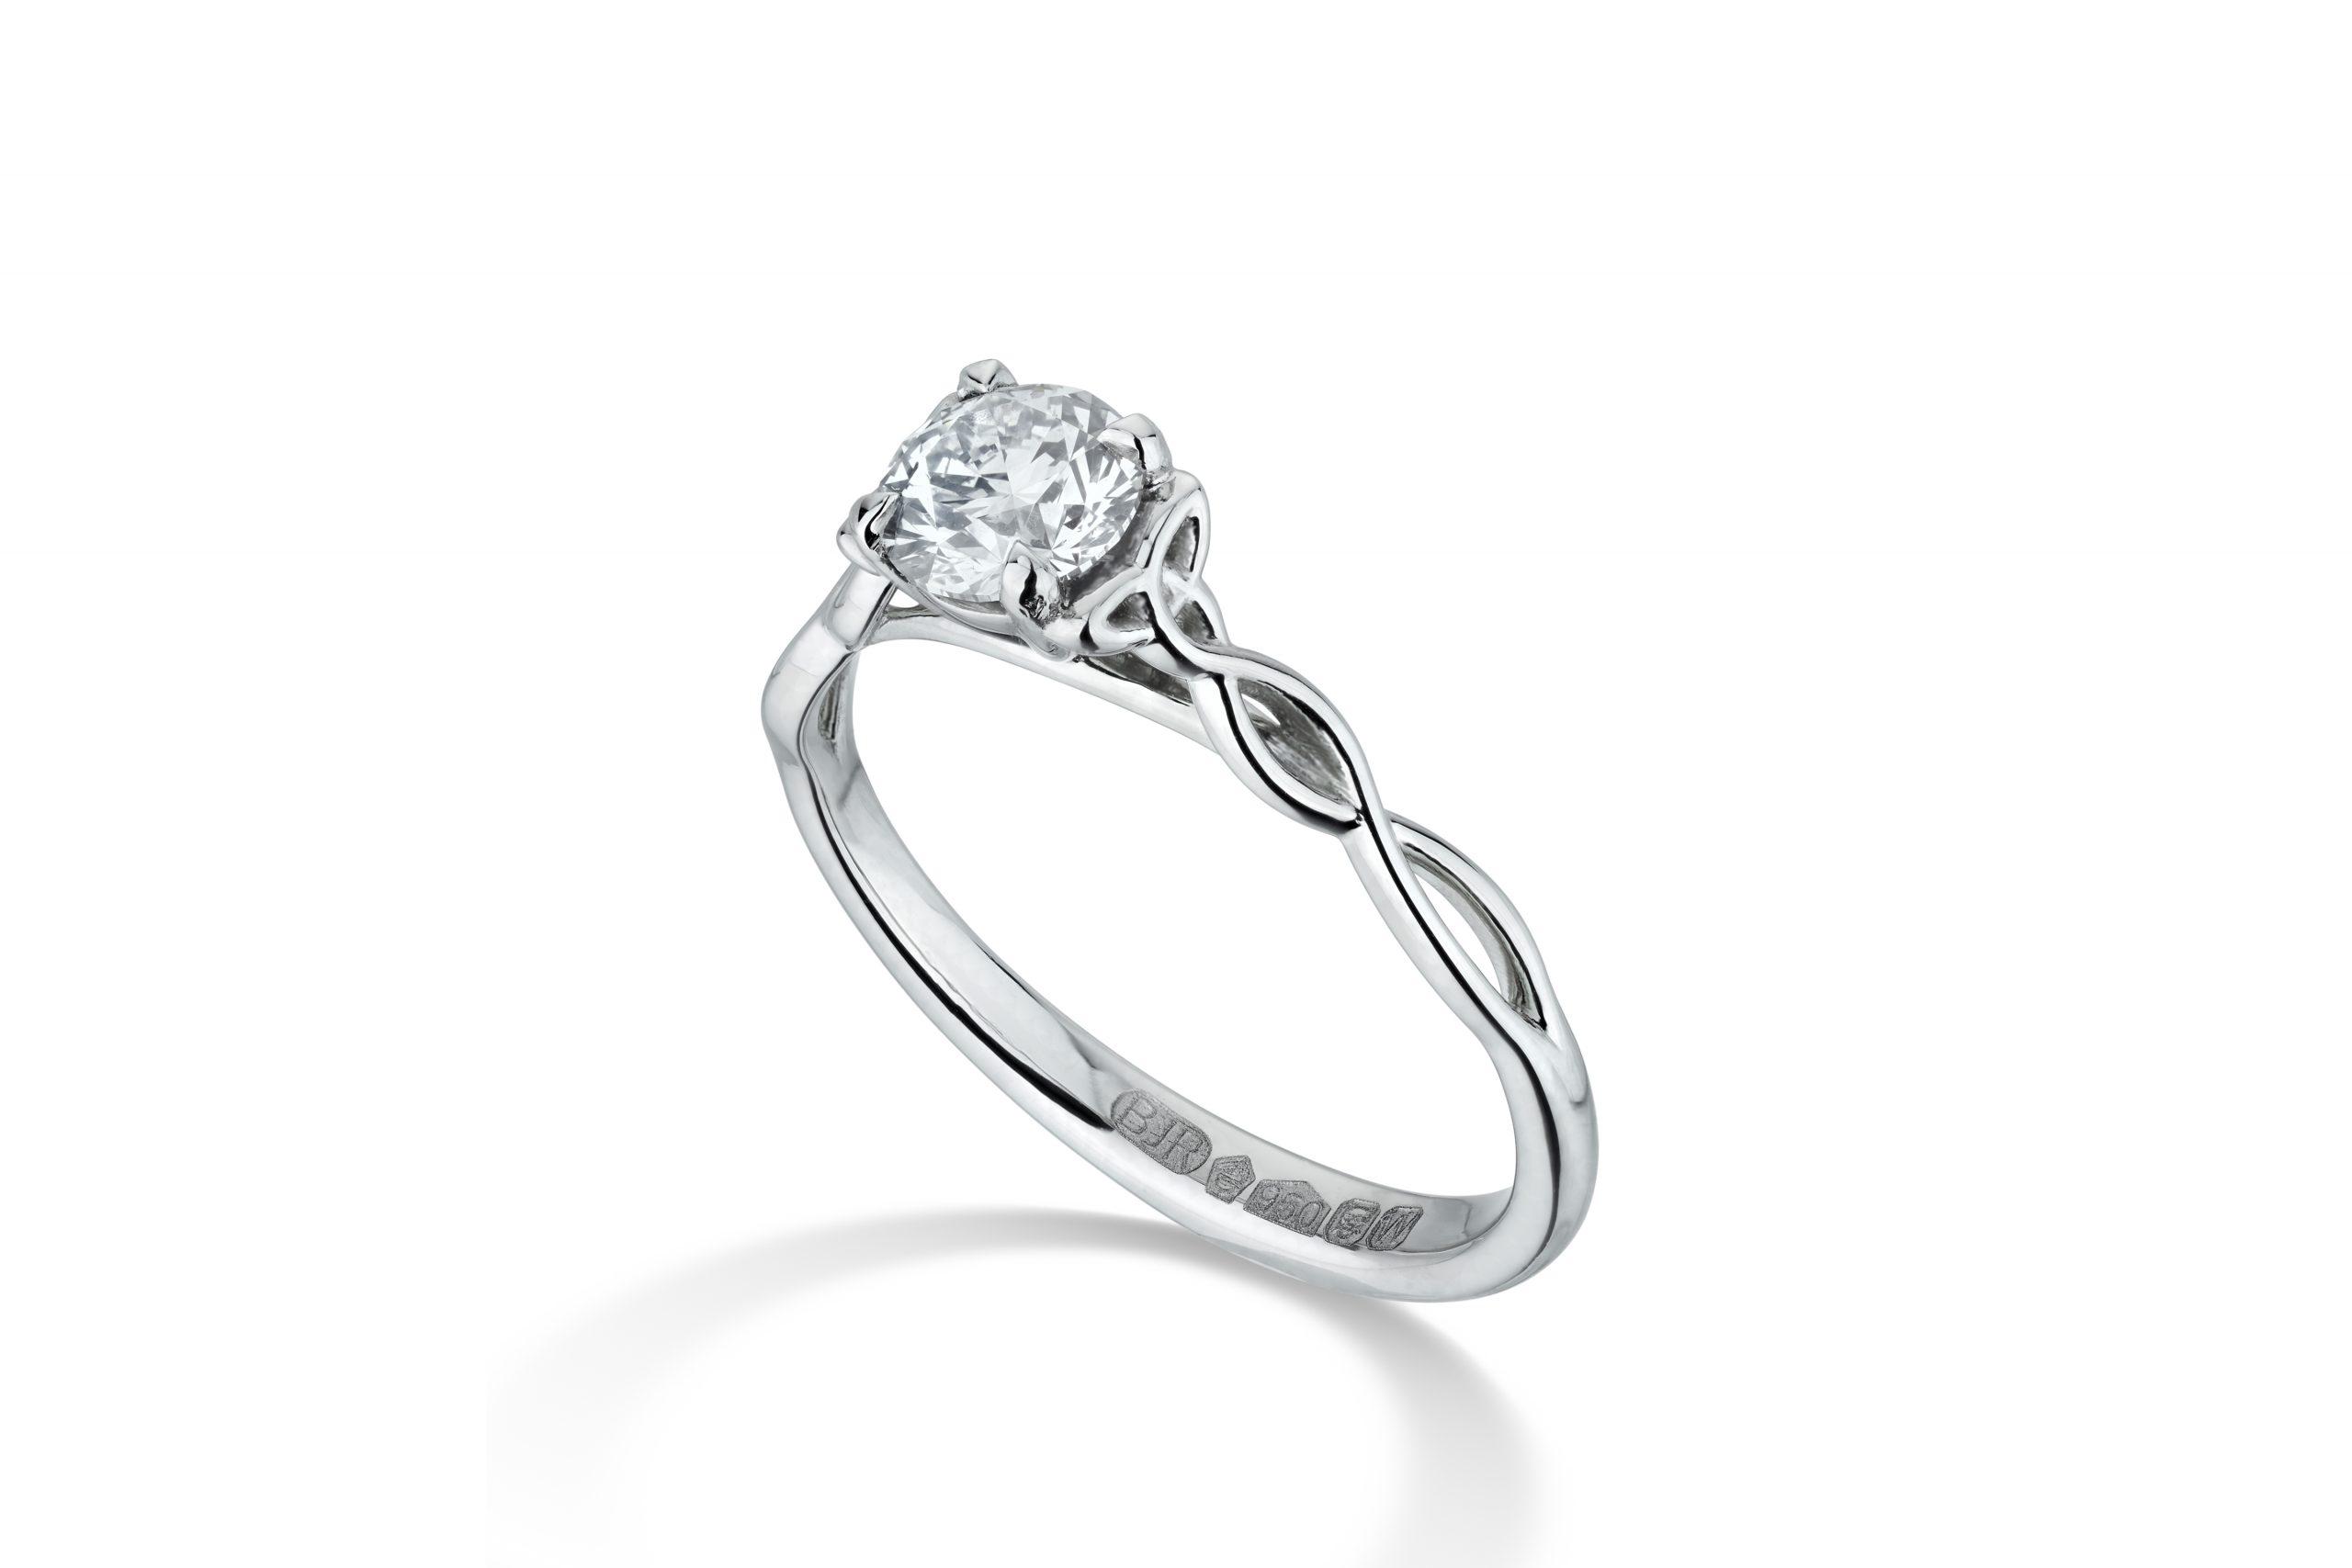 Celtic Knot Engagement Ring – Copyright BJRdesigns